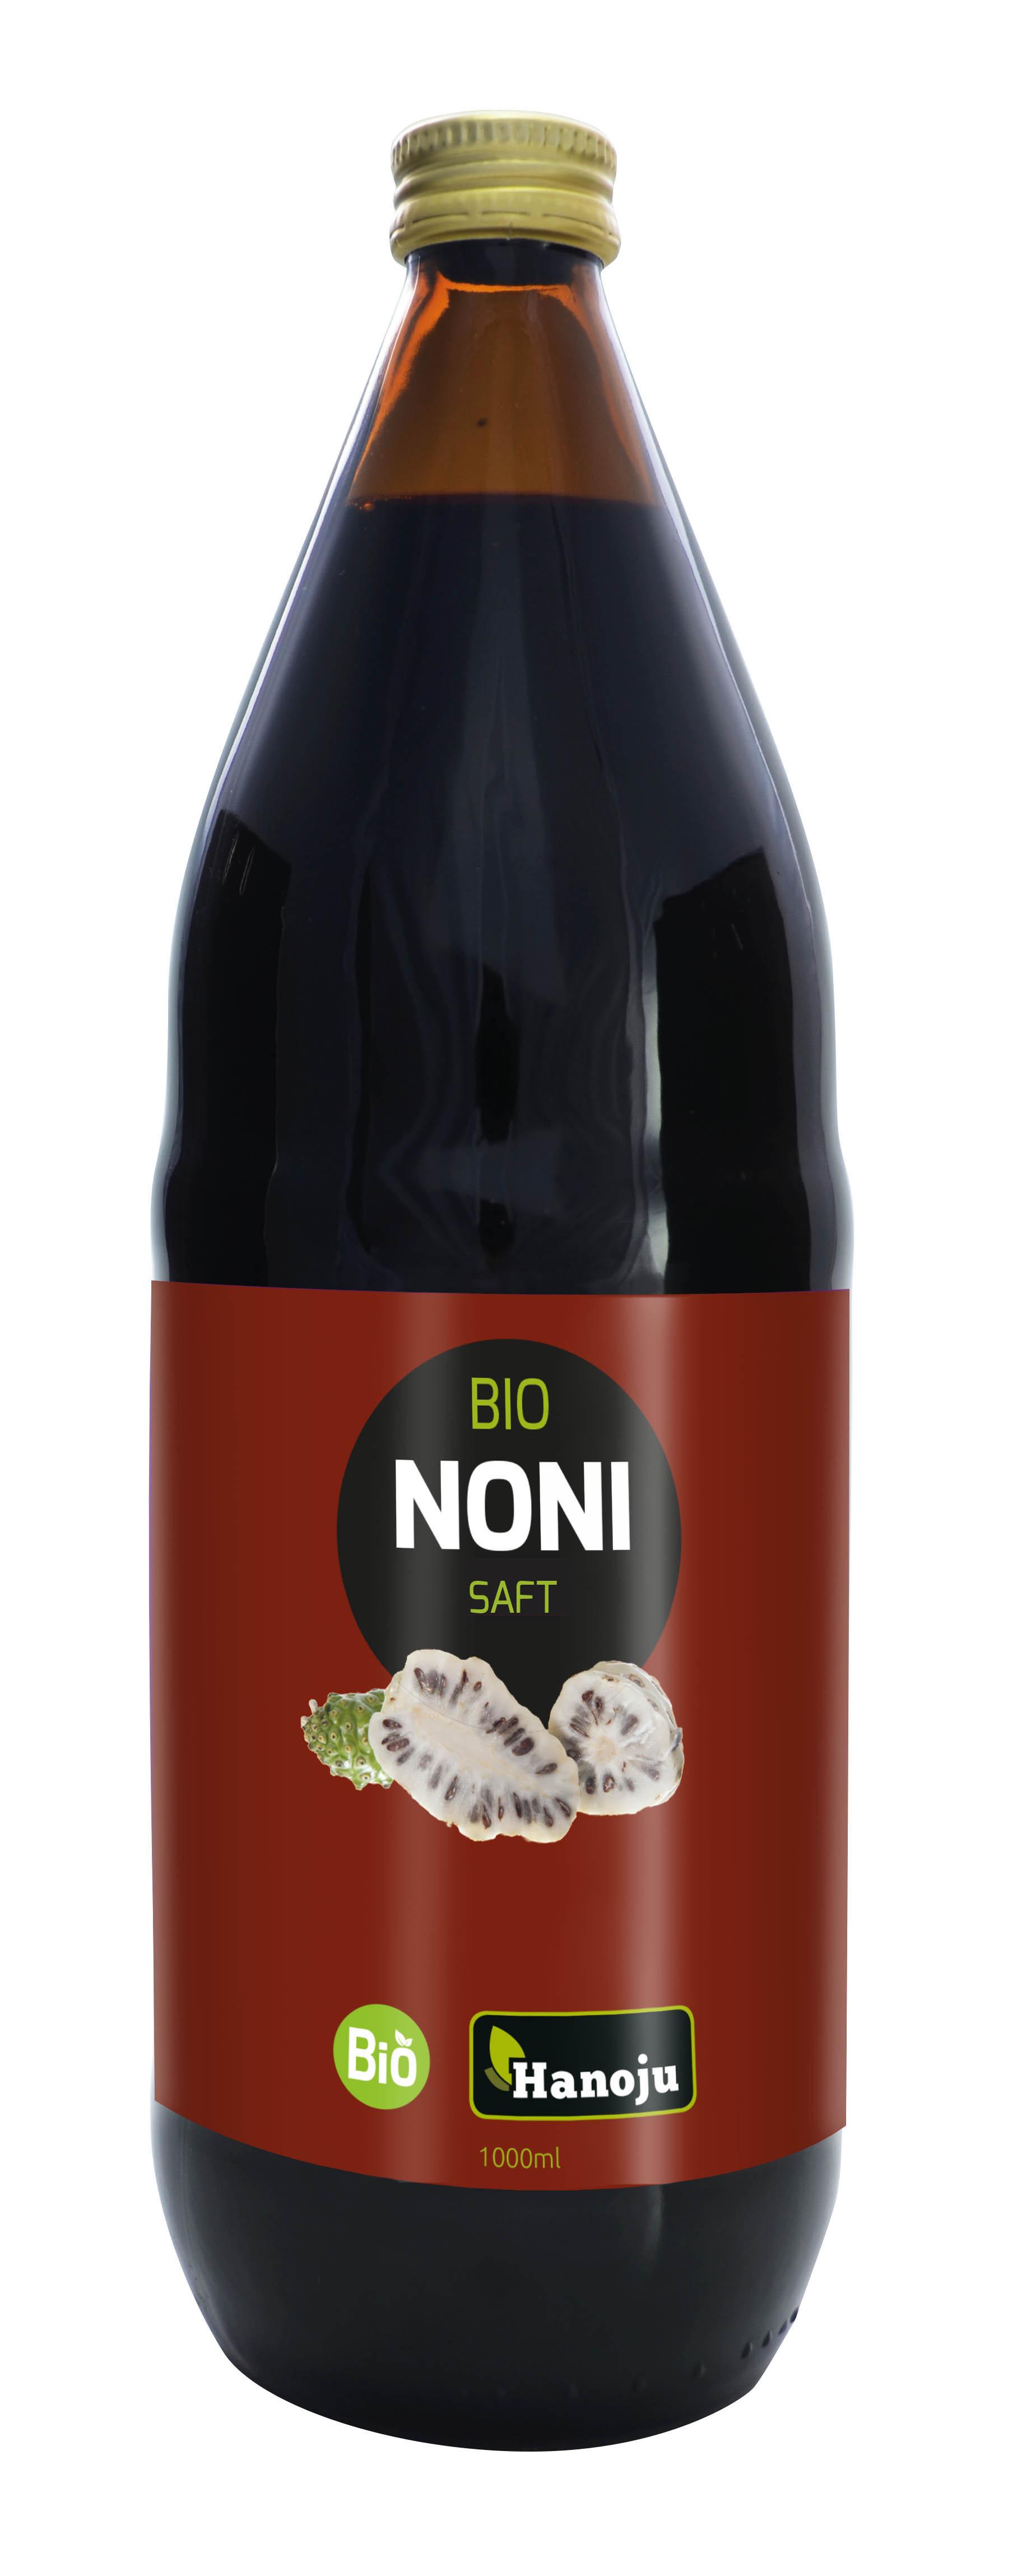 Hanoju Noni Saft Bio